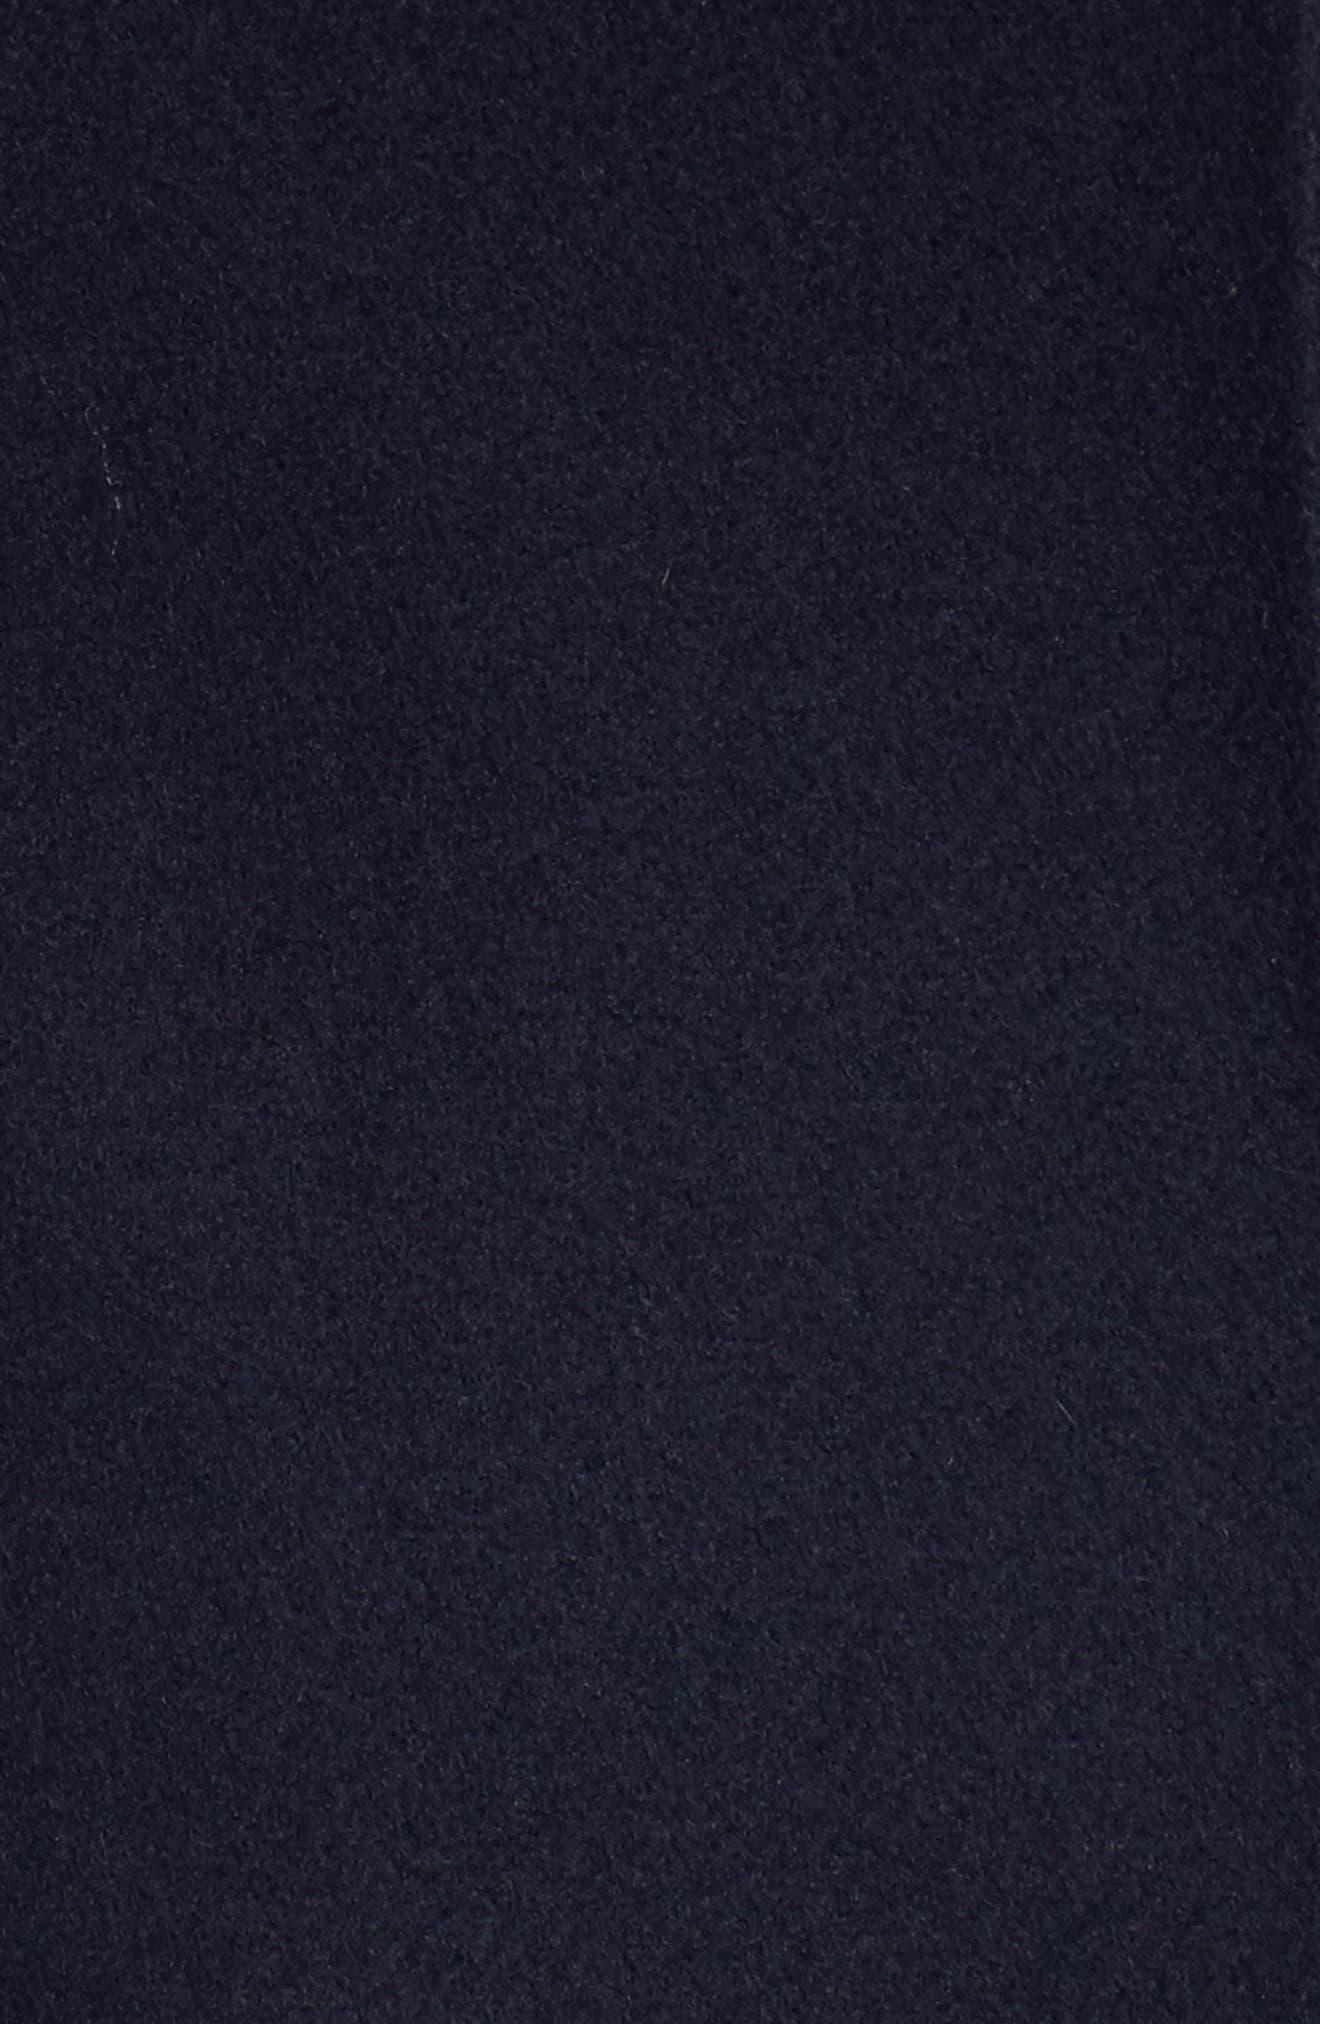 Wool Blend Asymmetrical Skirted Coat,                             Alternate thumbnail 5, color,                             Navy